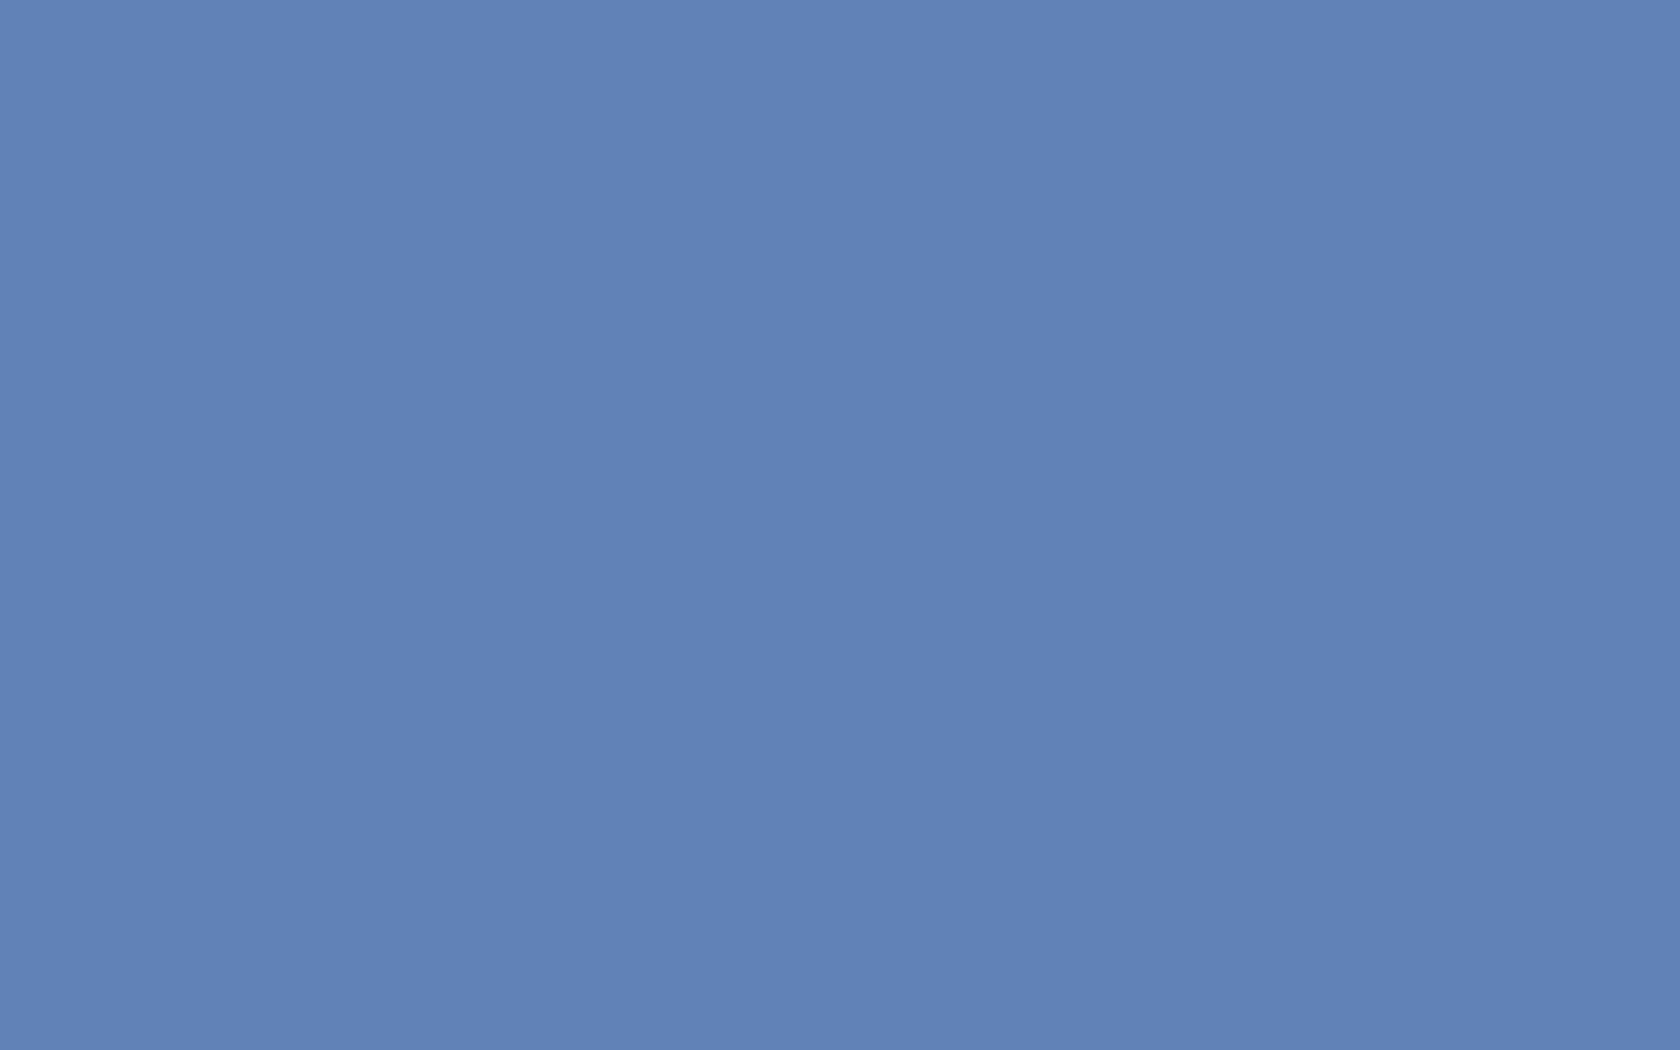 1680x1050 Glaucous Solid Color Background